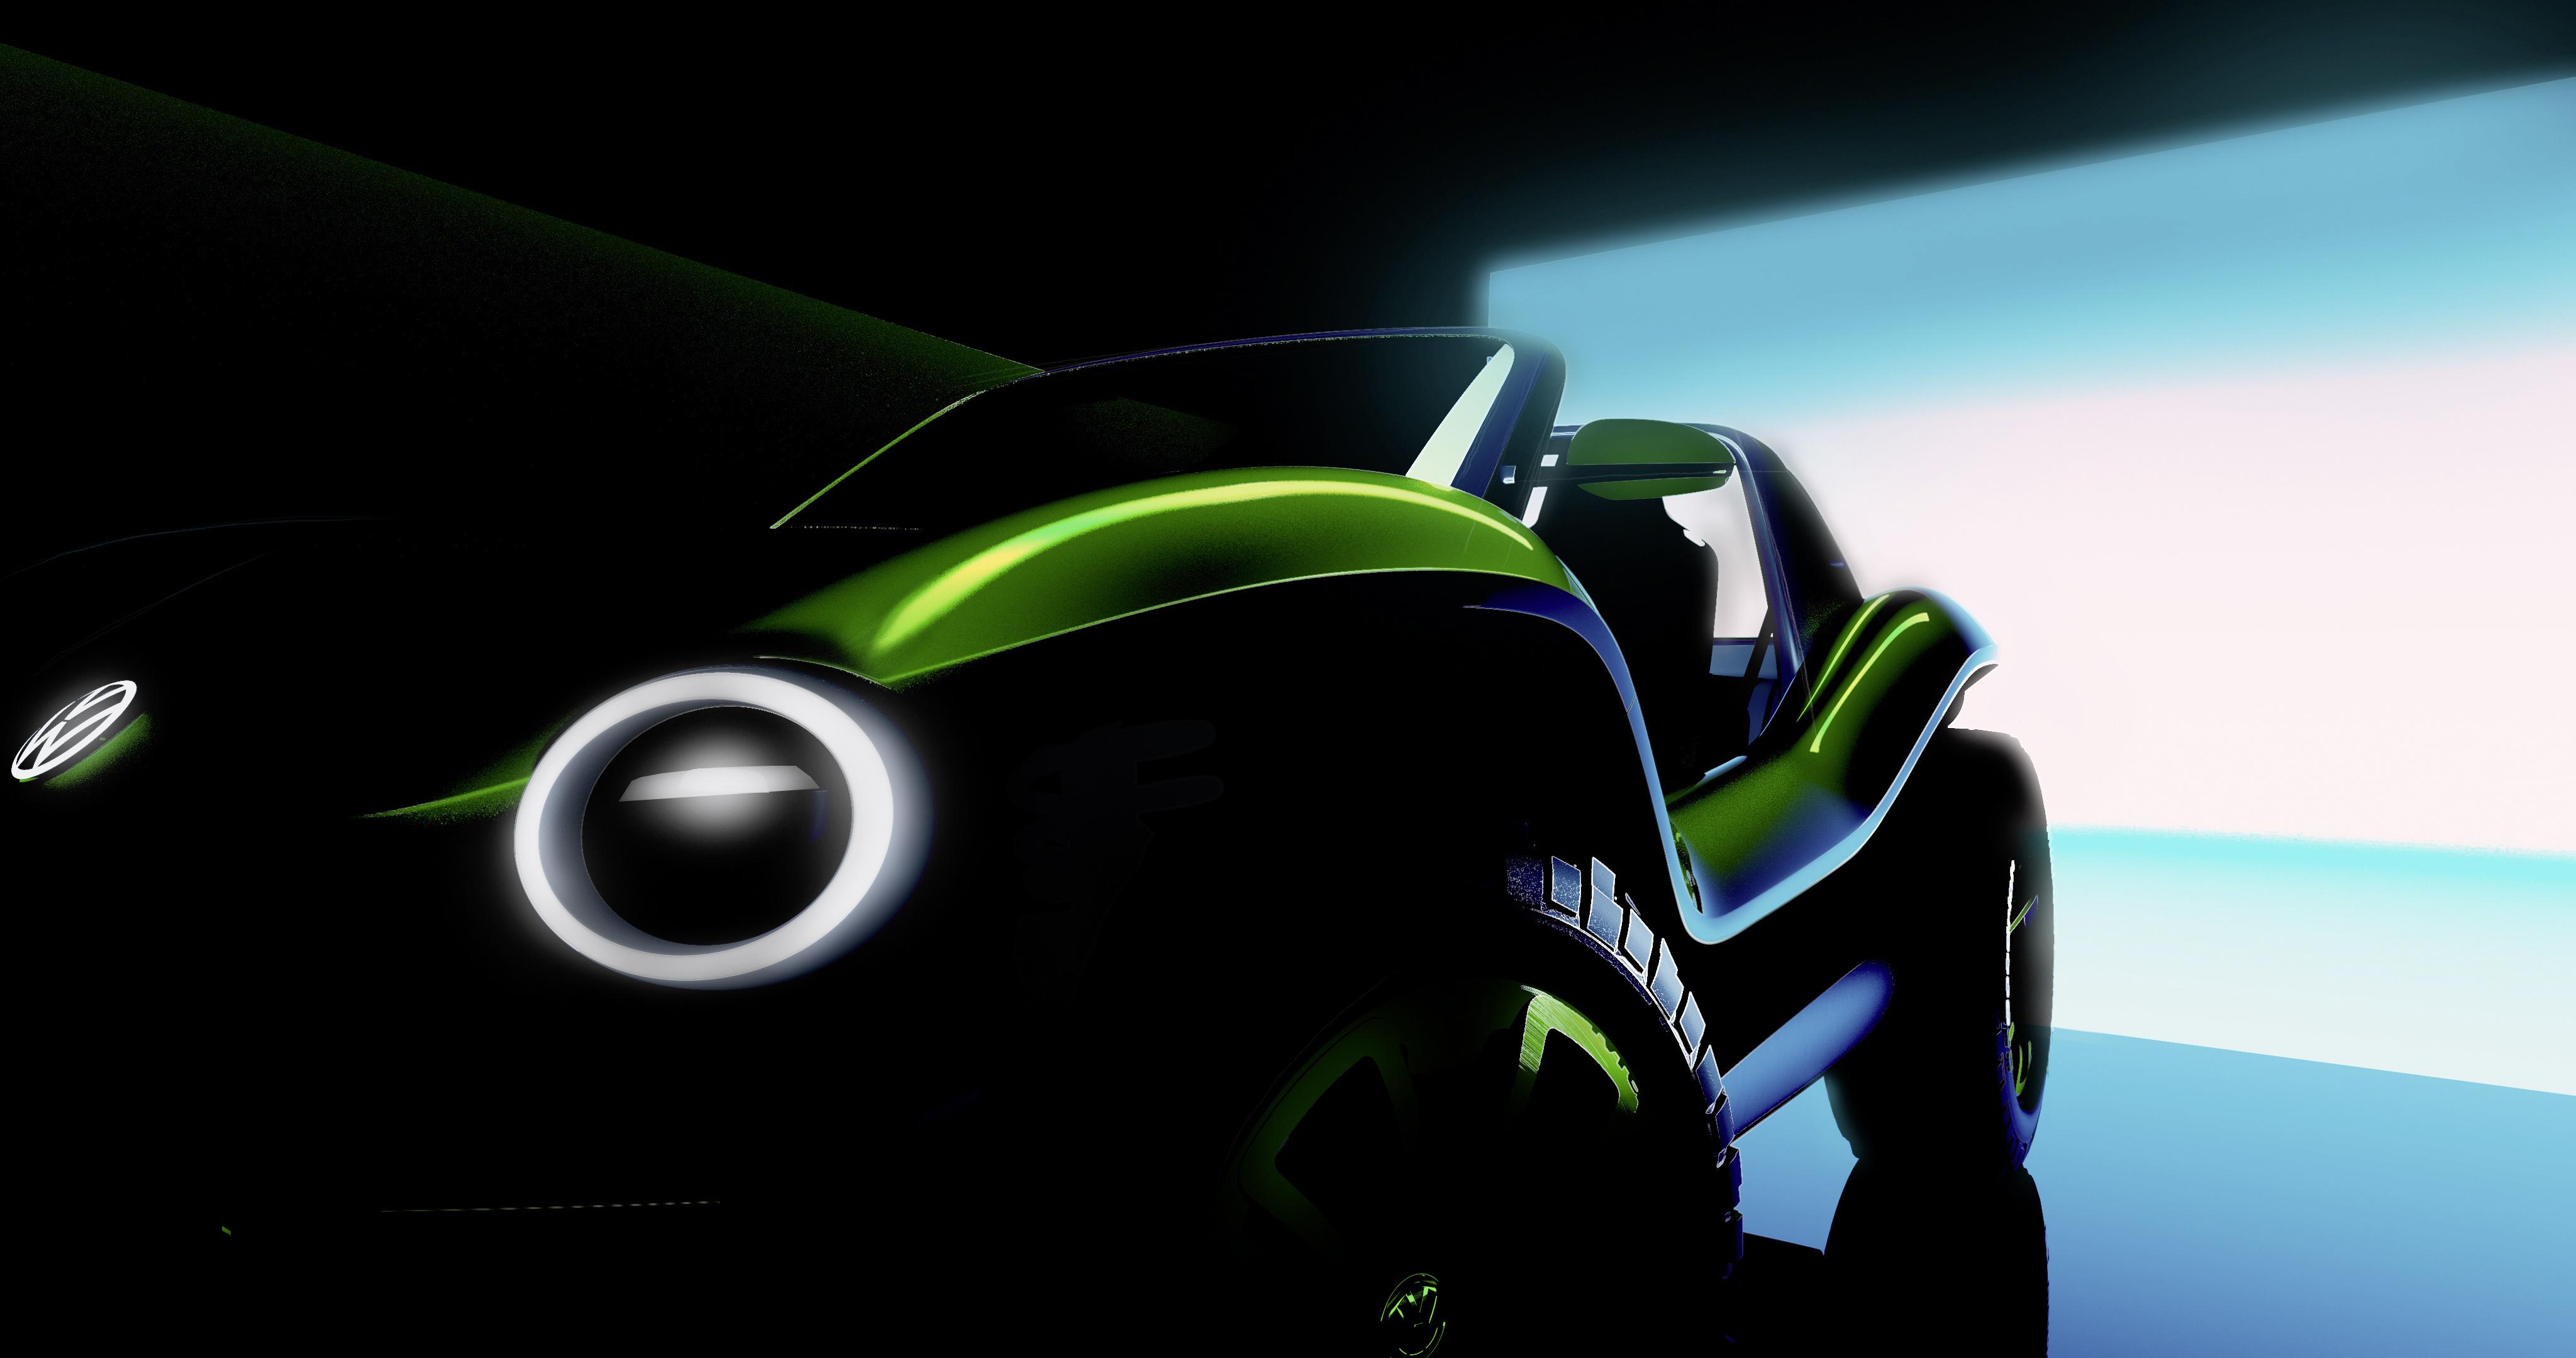 Klaus Bischoff Head Designer At Volkswagen Commented On The Upcoming Vehicle